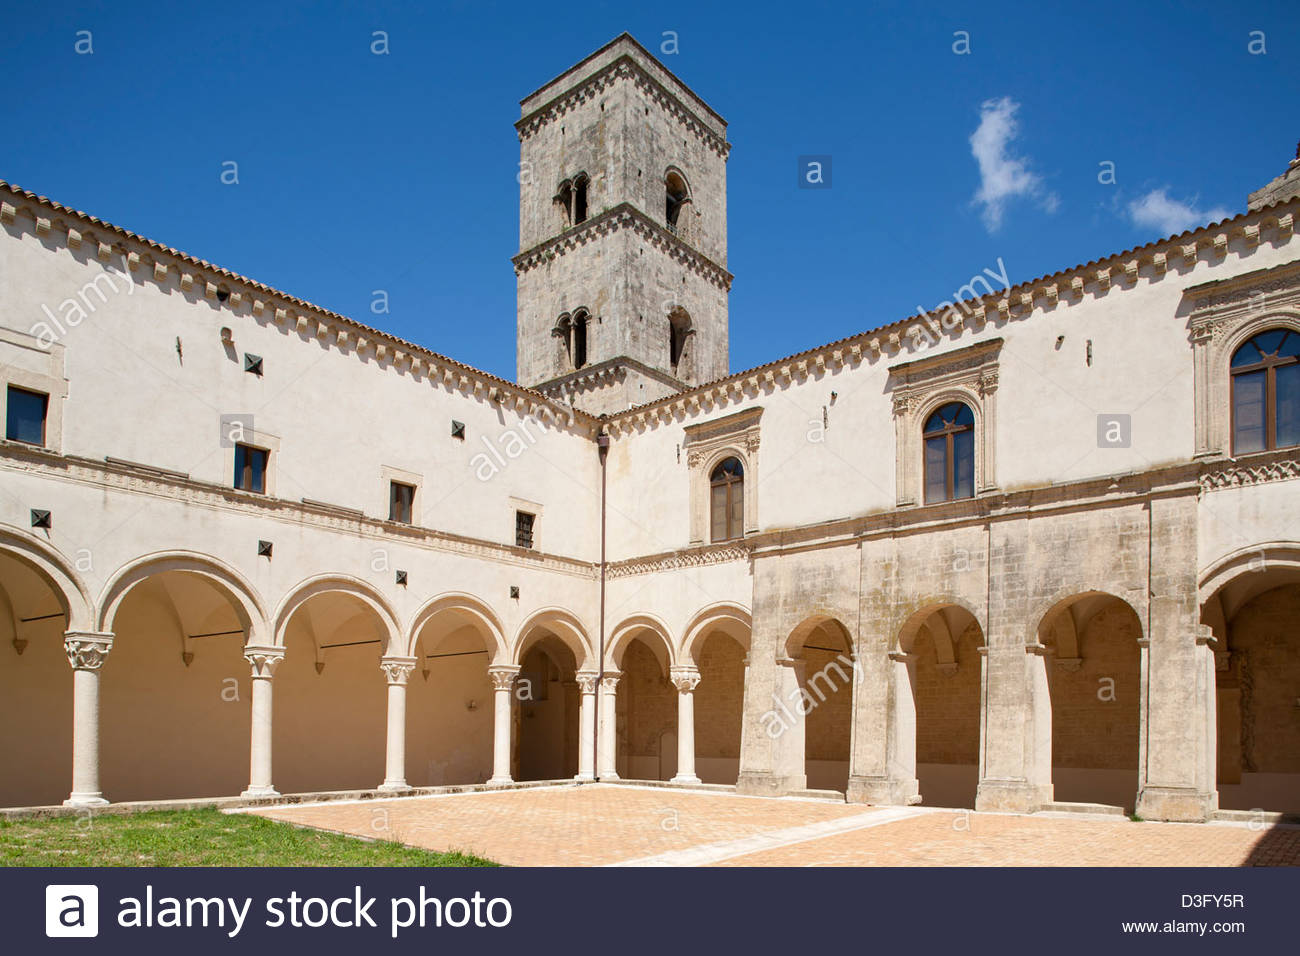 Cloître, Abbaye bénédictine de Saint Michel Archange,montescaglioso, balislicata,Italie Photo Stock